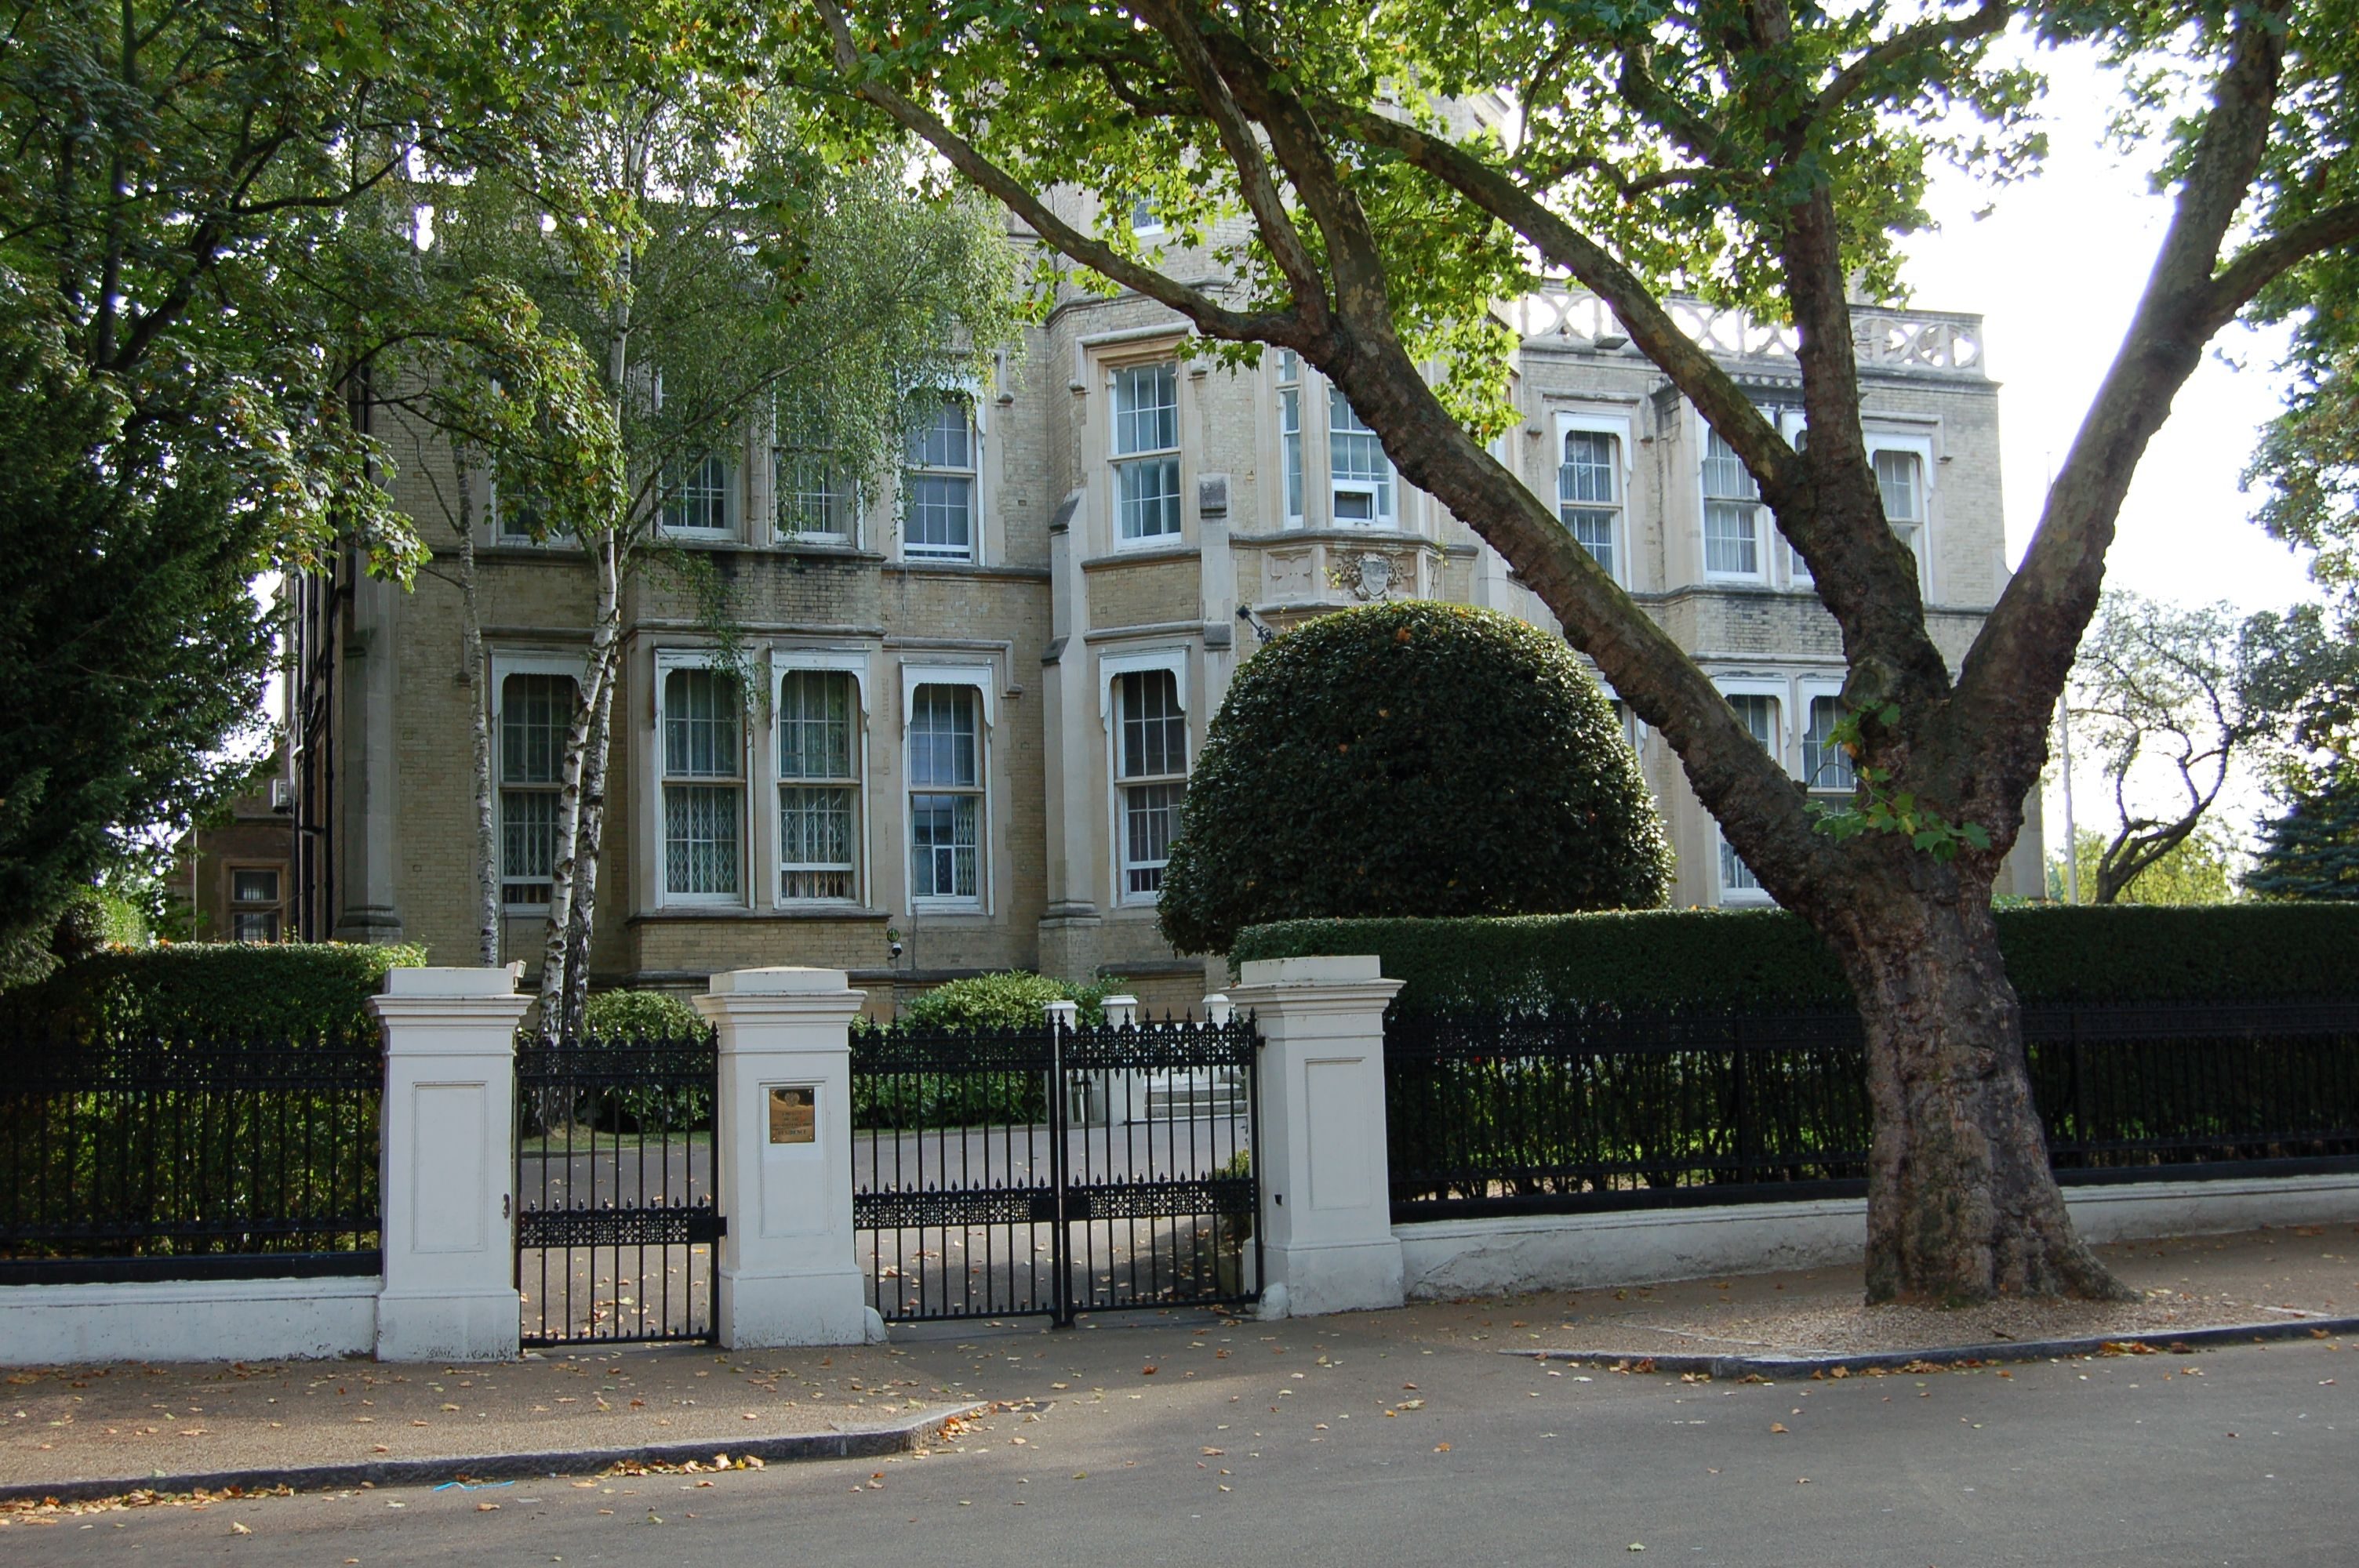 Image result for 9a Kensington Palace | Kensington palace ... on shop floor plans, london home rentals, london apartments floor plans, london flat floor plans, london home architecture, london home design, london home construction,